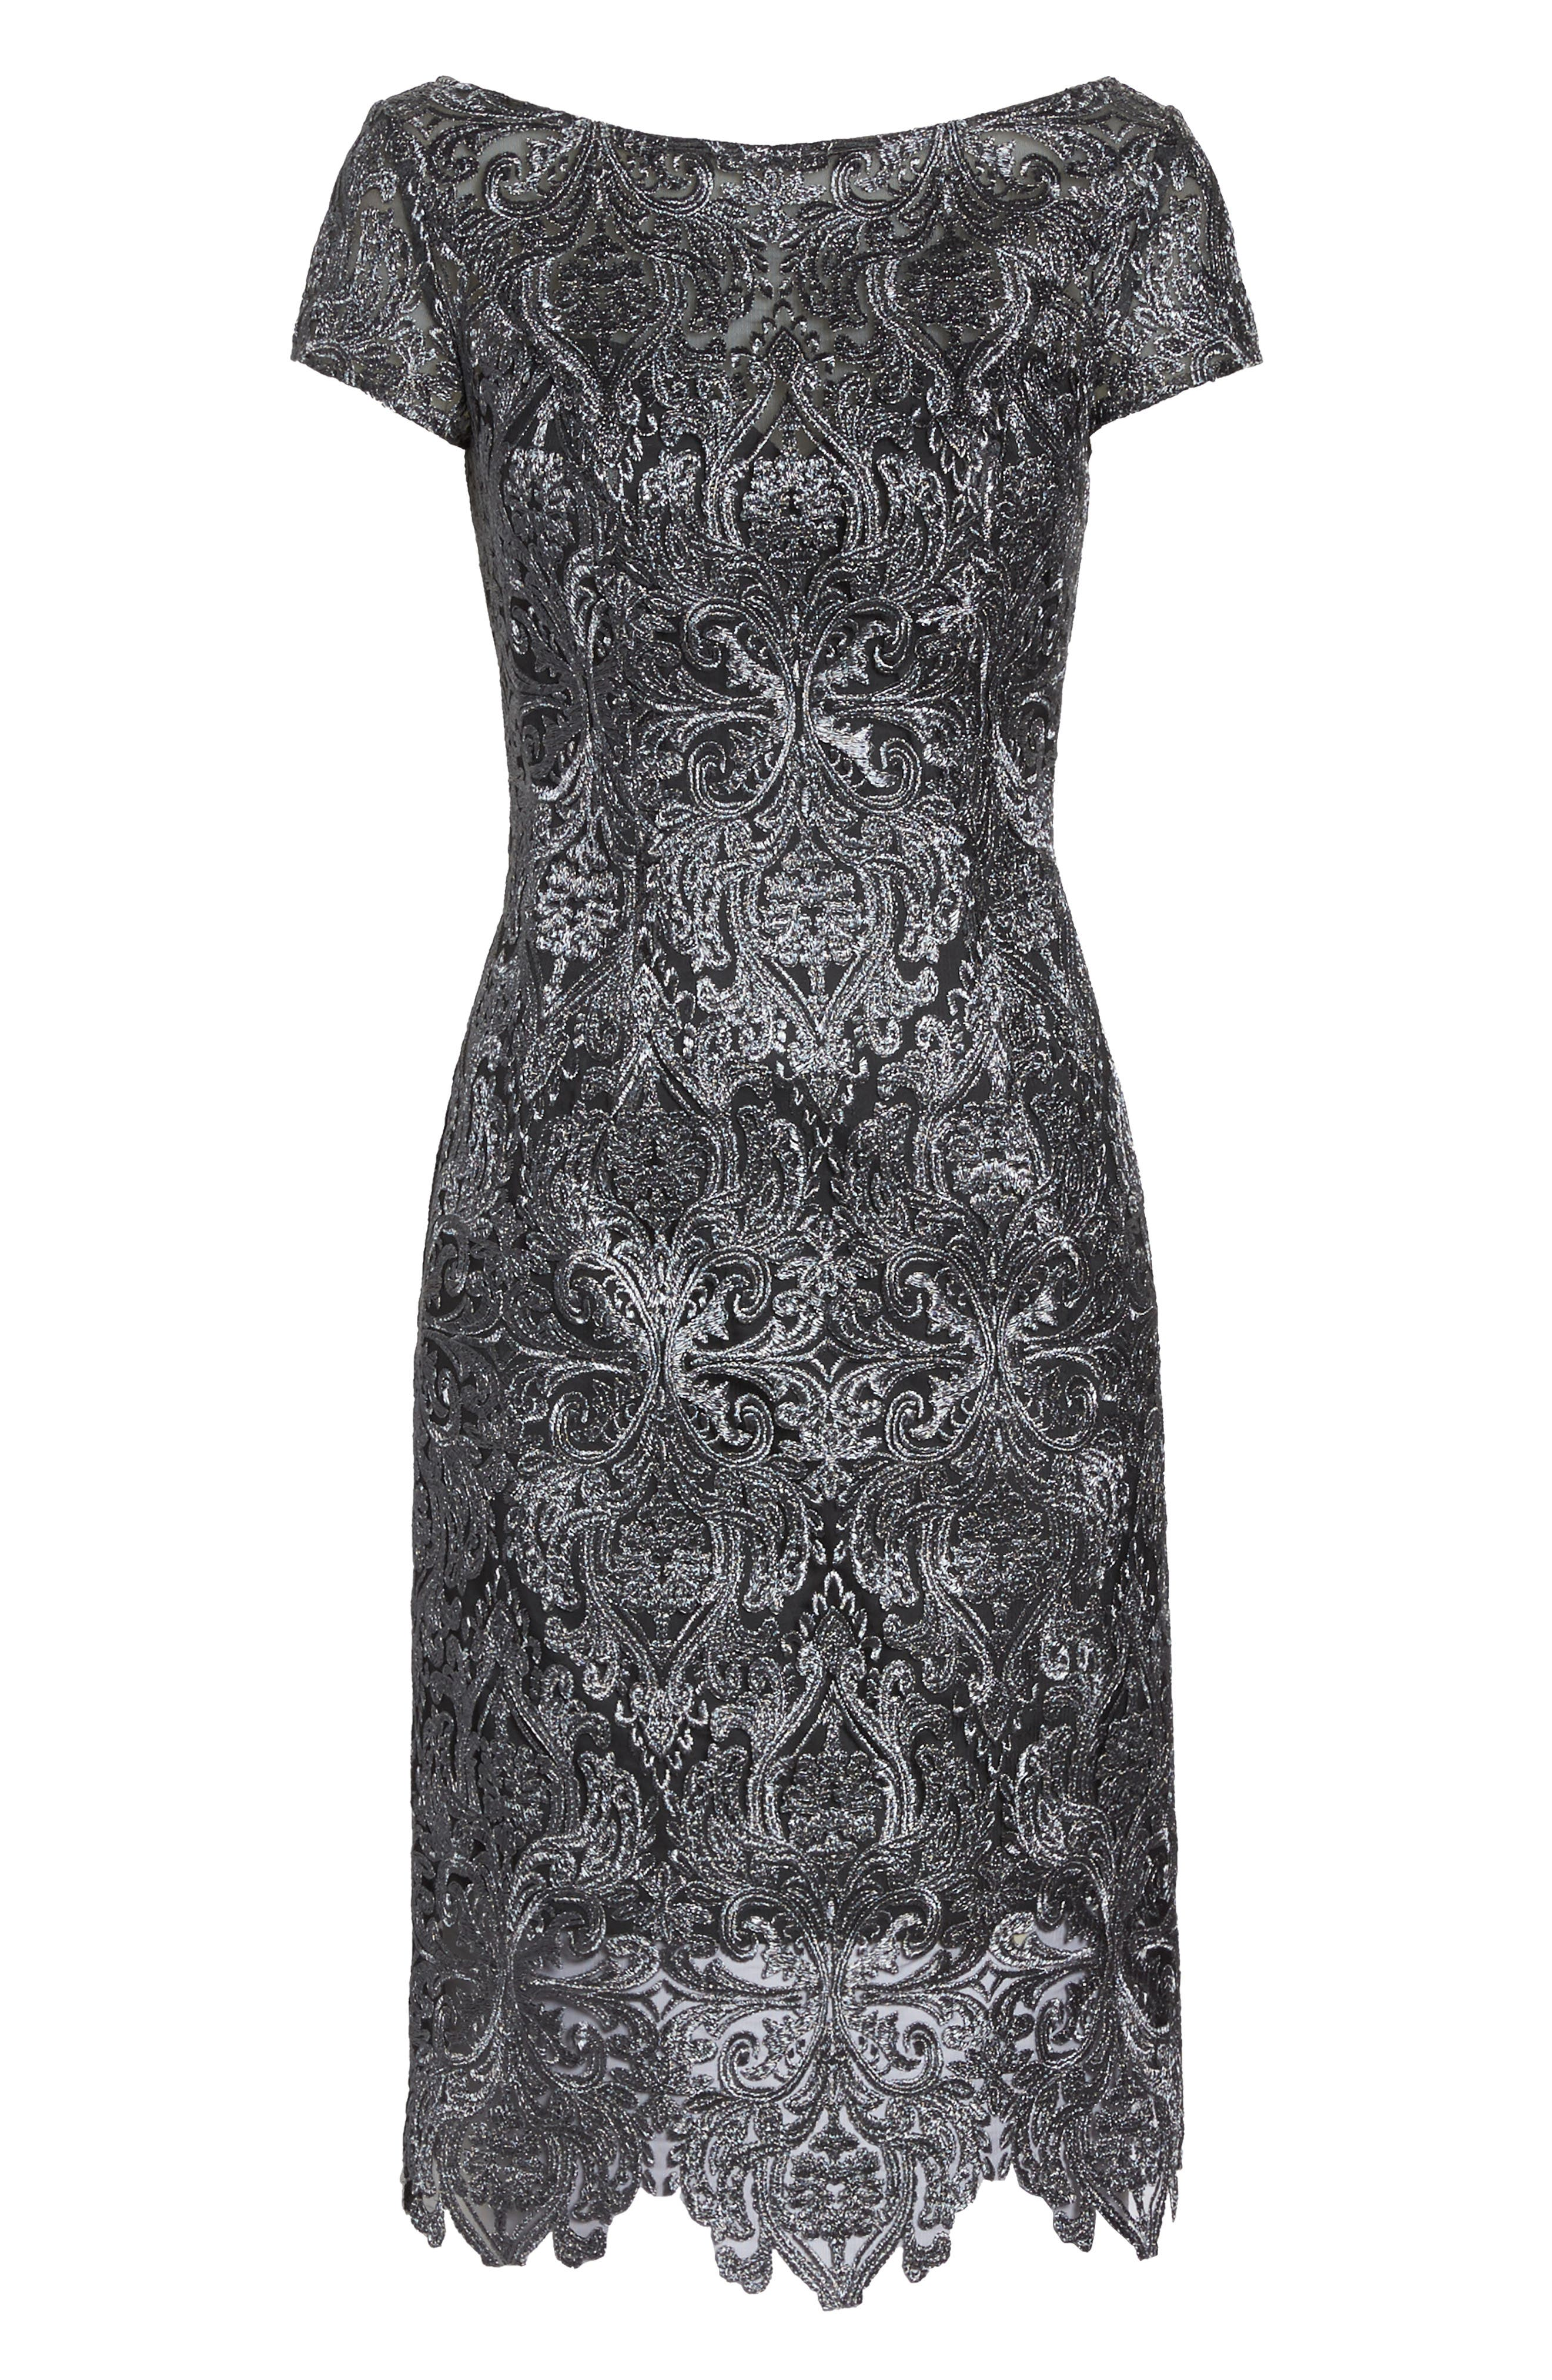 Lace Bateau Neck Dress,                             Alternate thumbnail 6, color,                             GUNMETAL